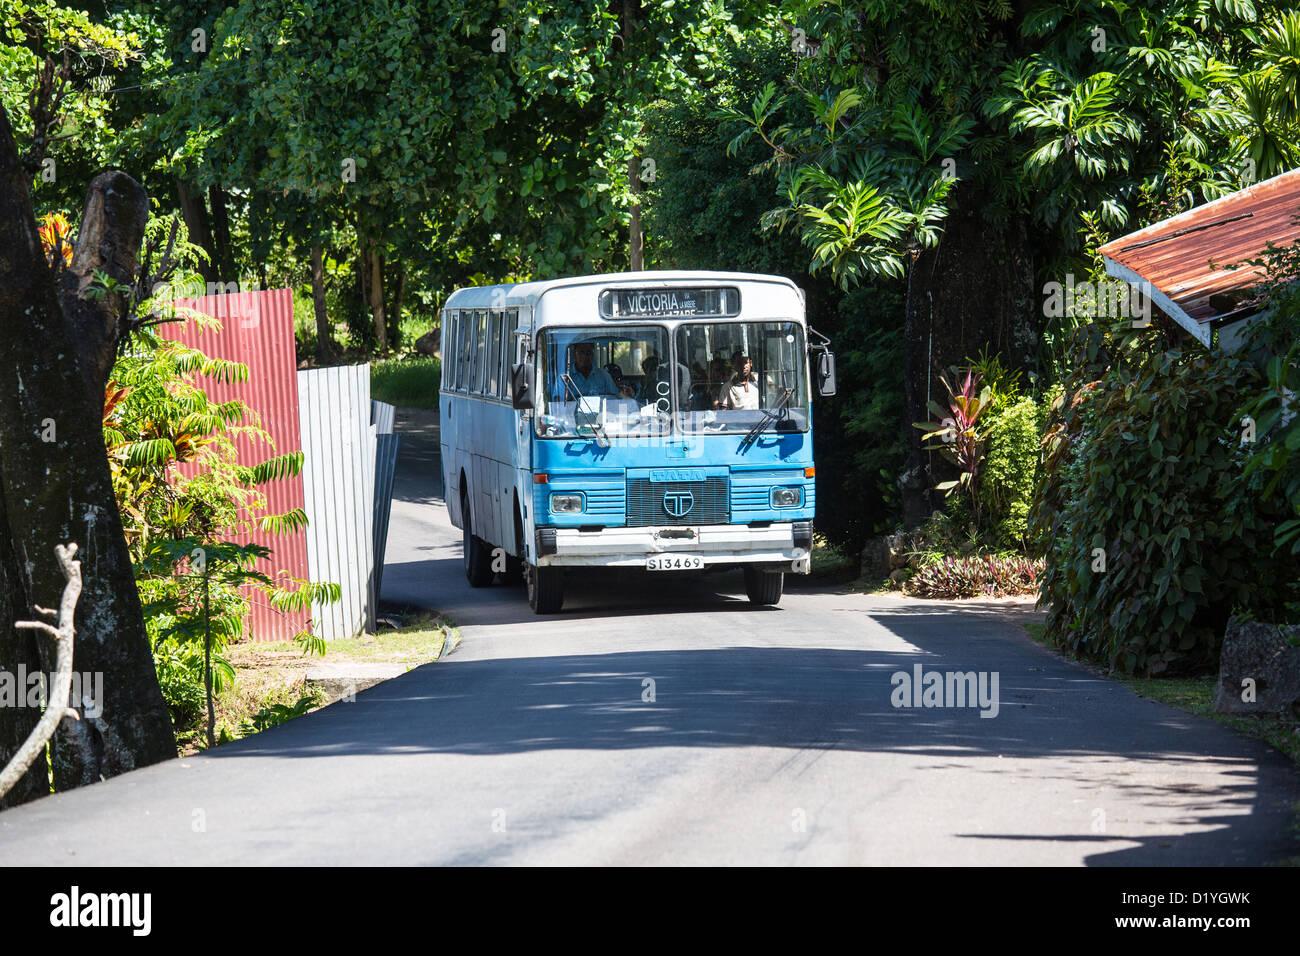 Public bus, Mahe Island, Seychelles - Stock Image